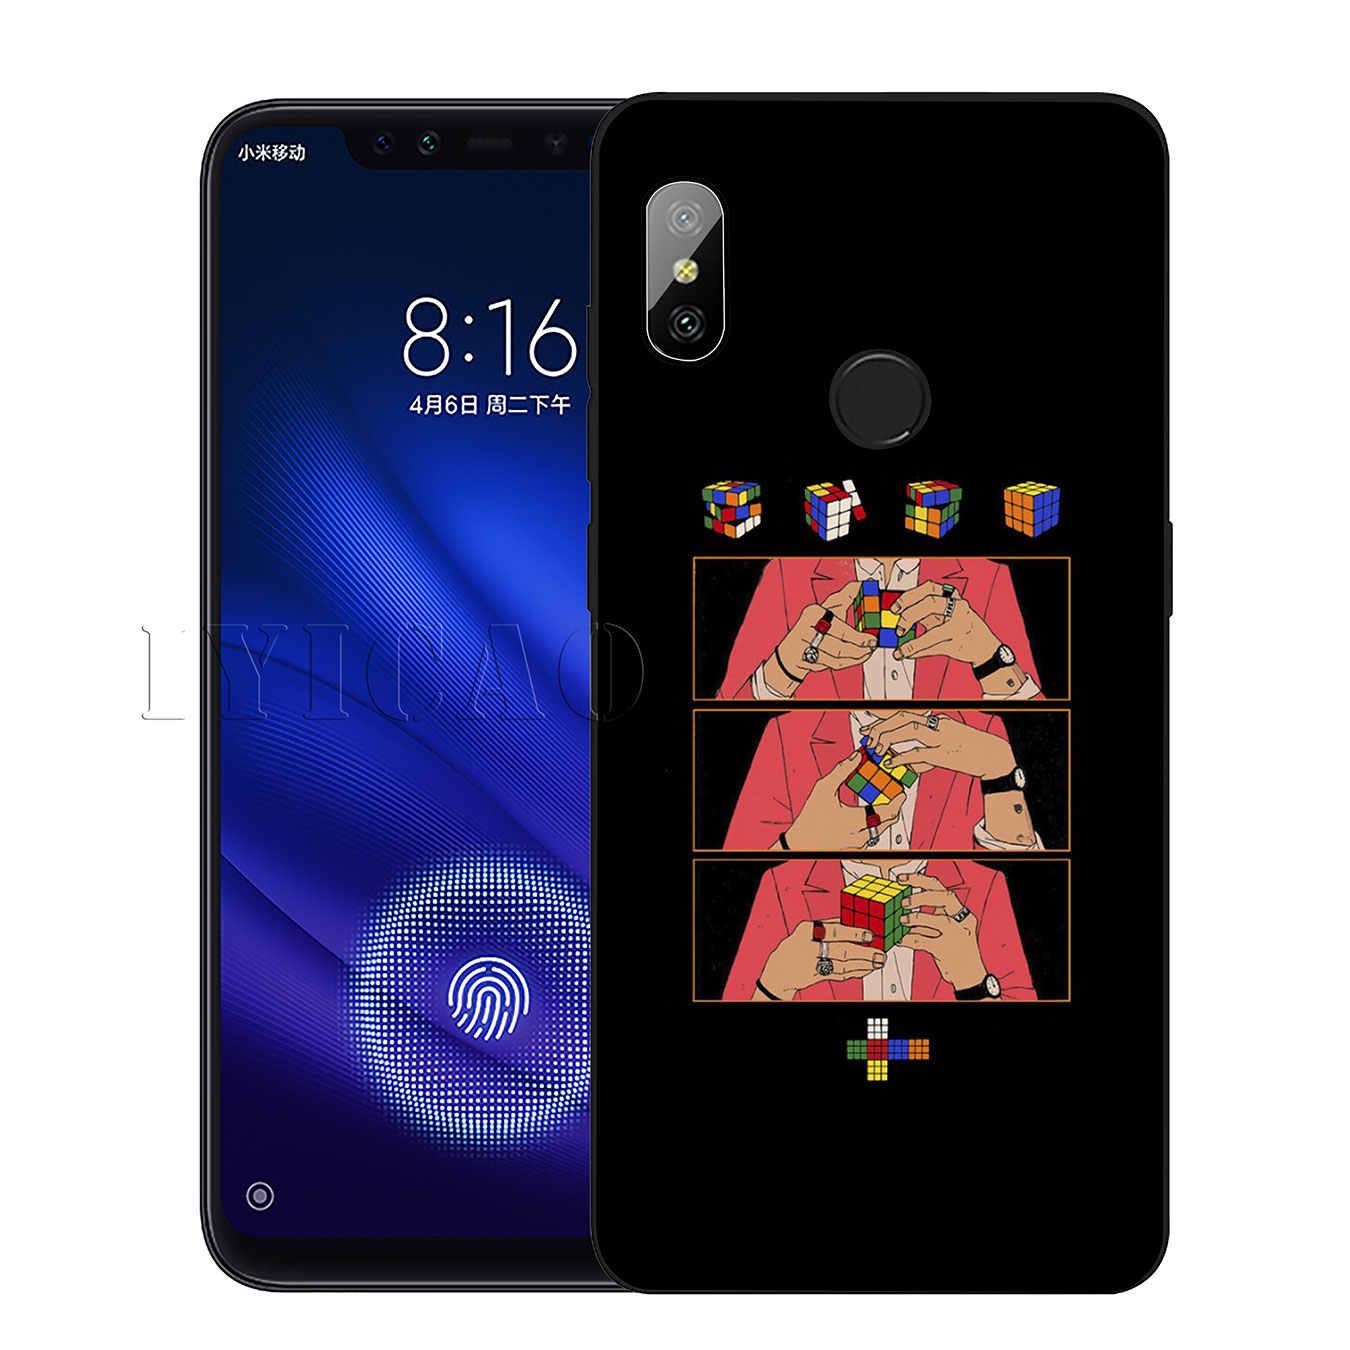 IYICAO ハリースタイル Behandeln Menschen 最上位のため Xiaomi Redmi 6A 5A 注 7 4 4 × 5 プラス 6 プロ黒カバー